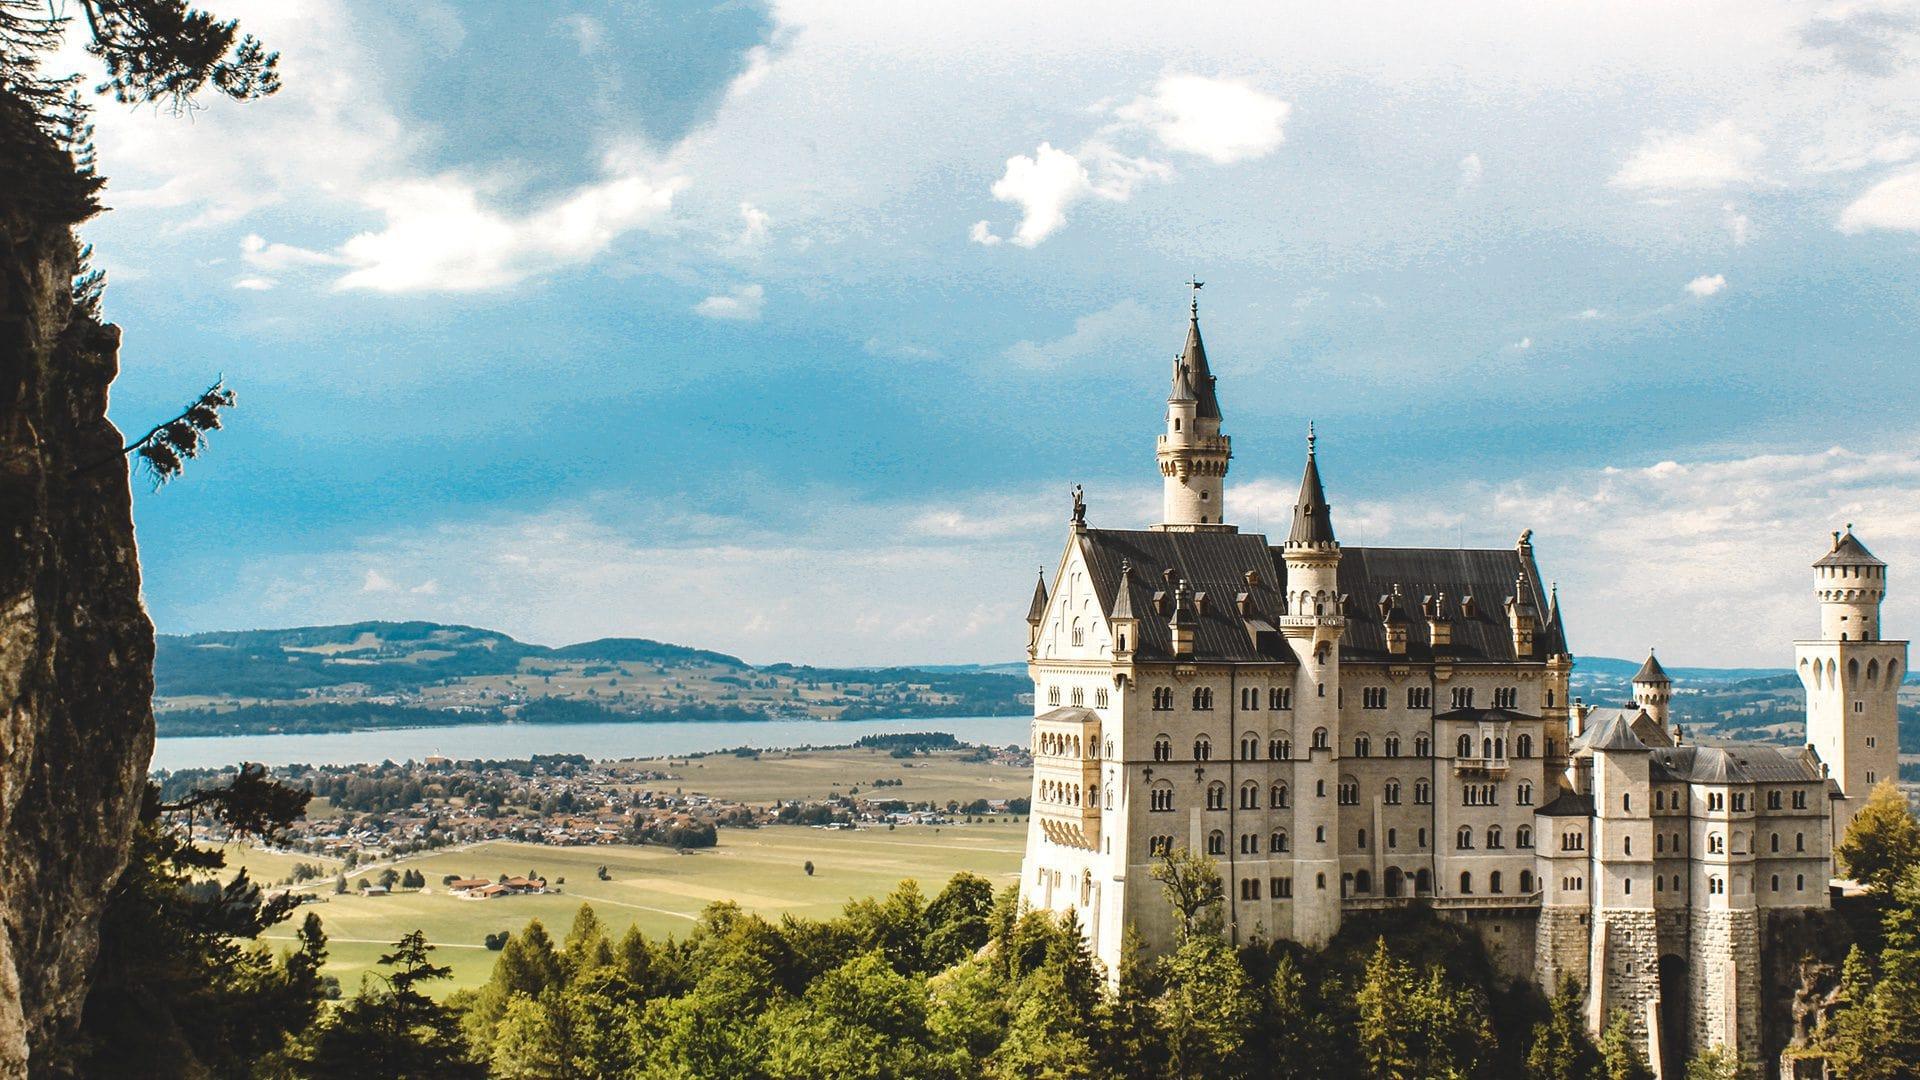 Castillo de Neuschwanstein | Rojo Cangrejo Blog de Viajes